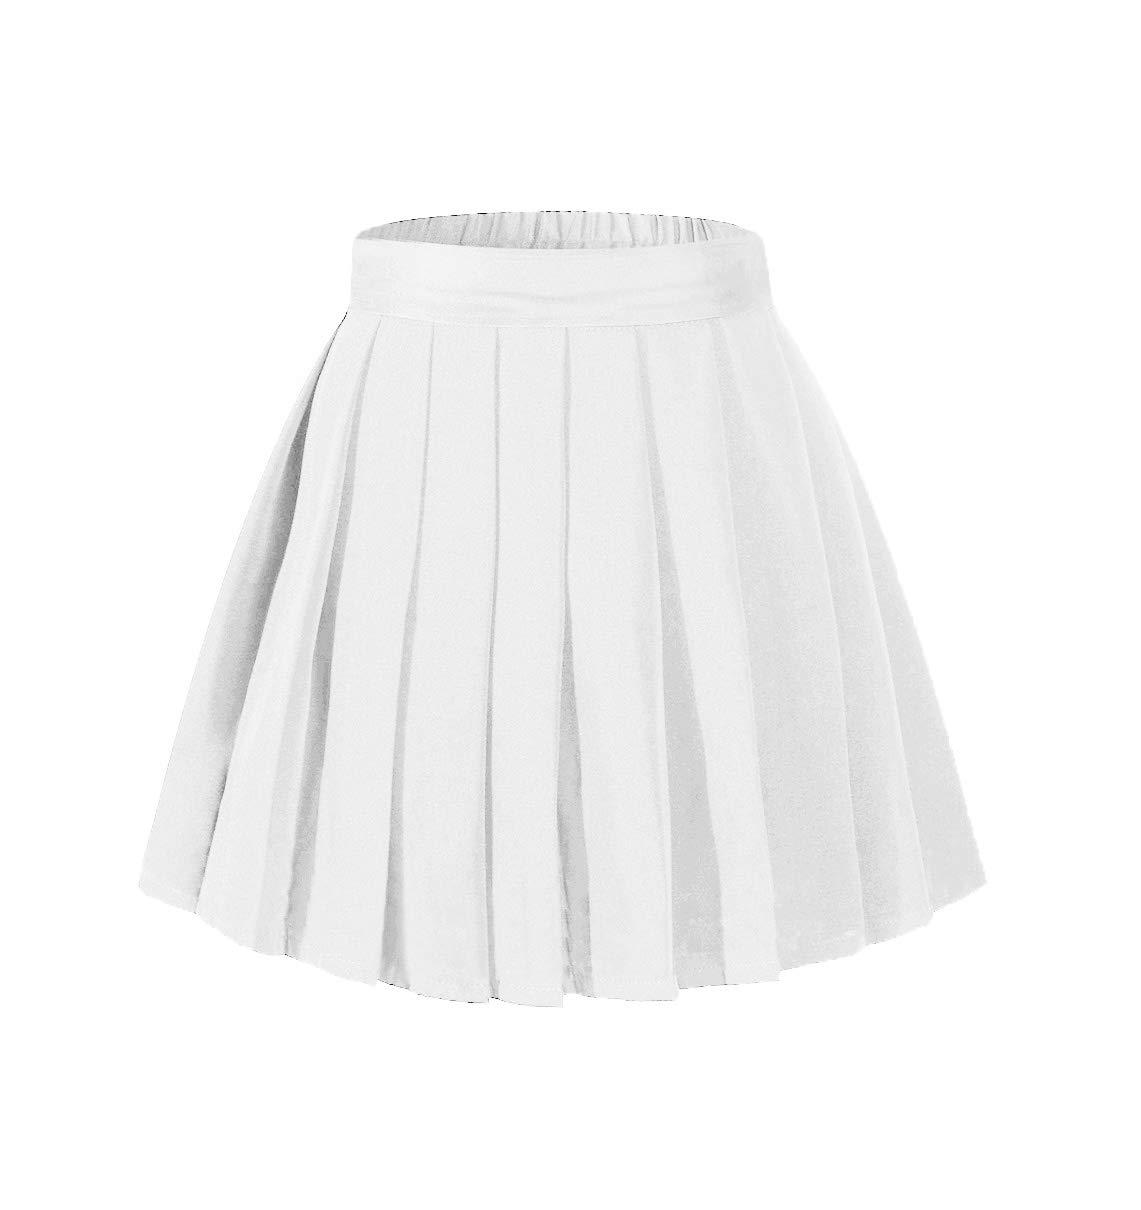 Beautifulfashionlife Women's High Waist Pleated Nurse Roleplay Suit Costumes White,XL by Beautifulfashionlife